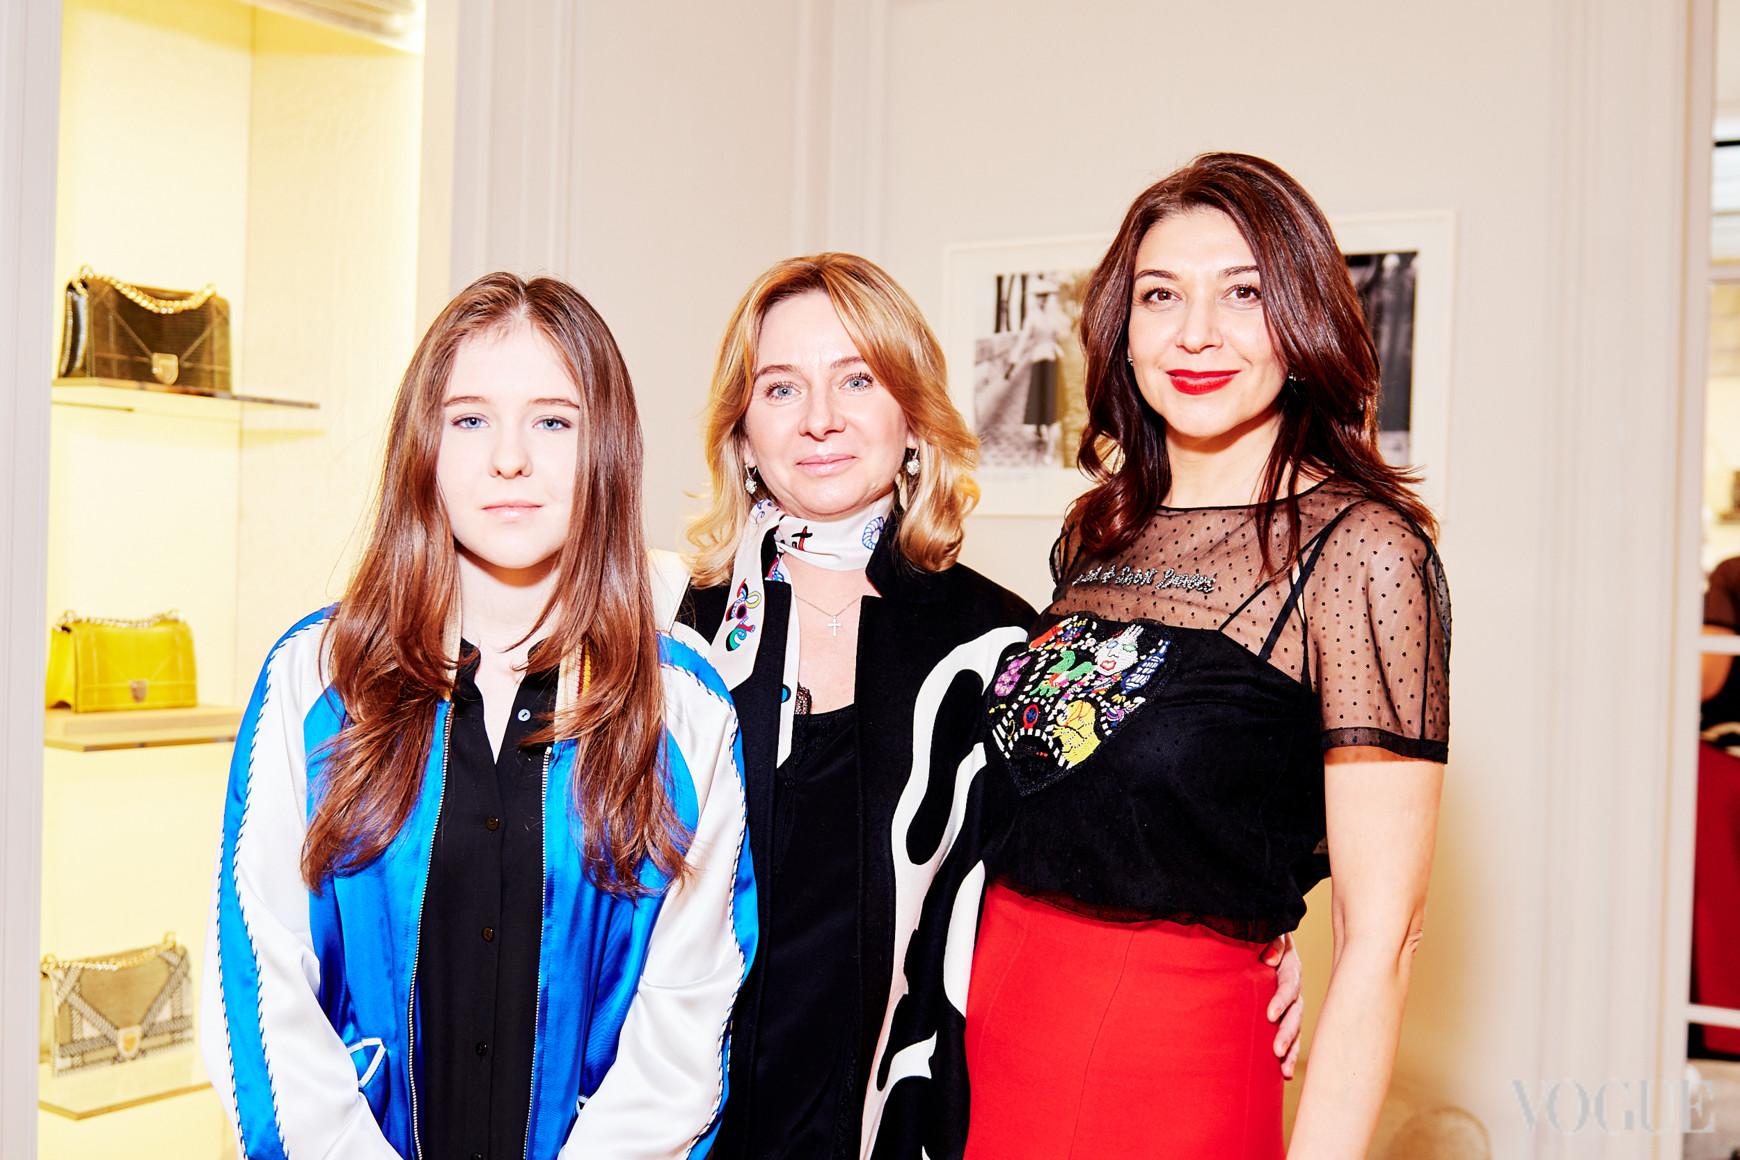 Ирина Морозова с дочерью и Ольга Дашкиева